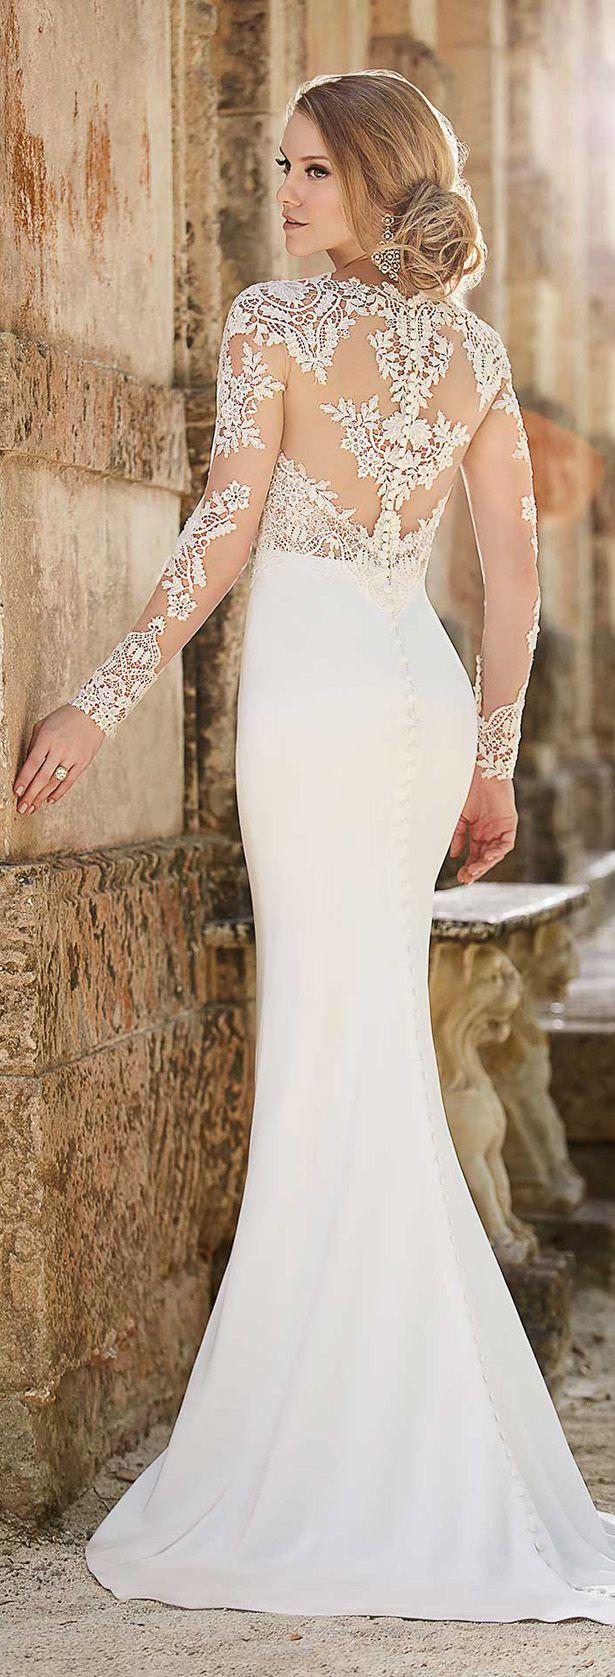 Wedding-Dresses-0736